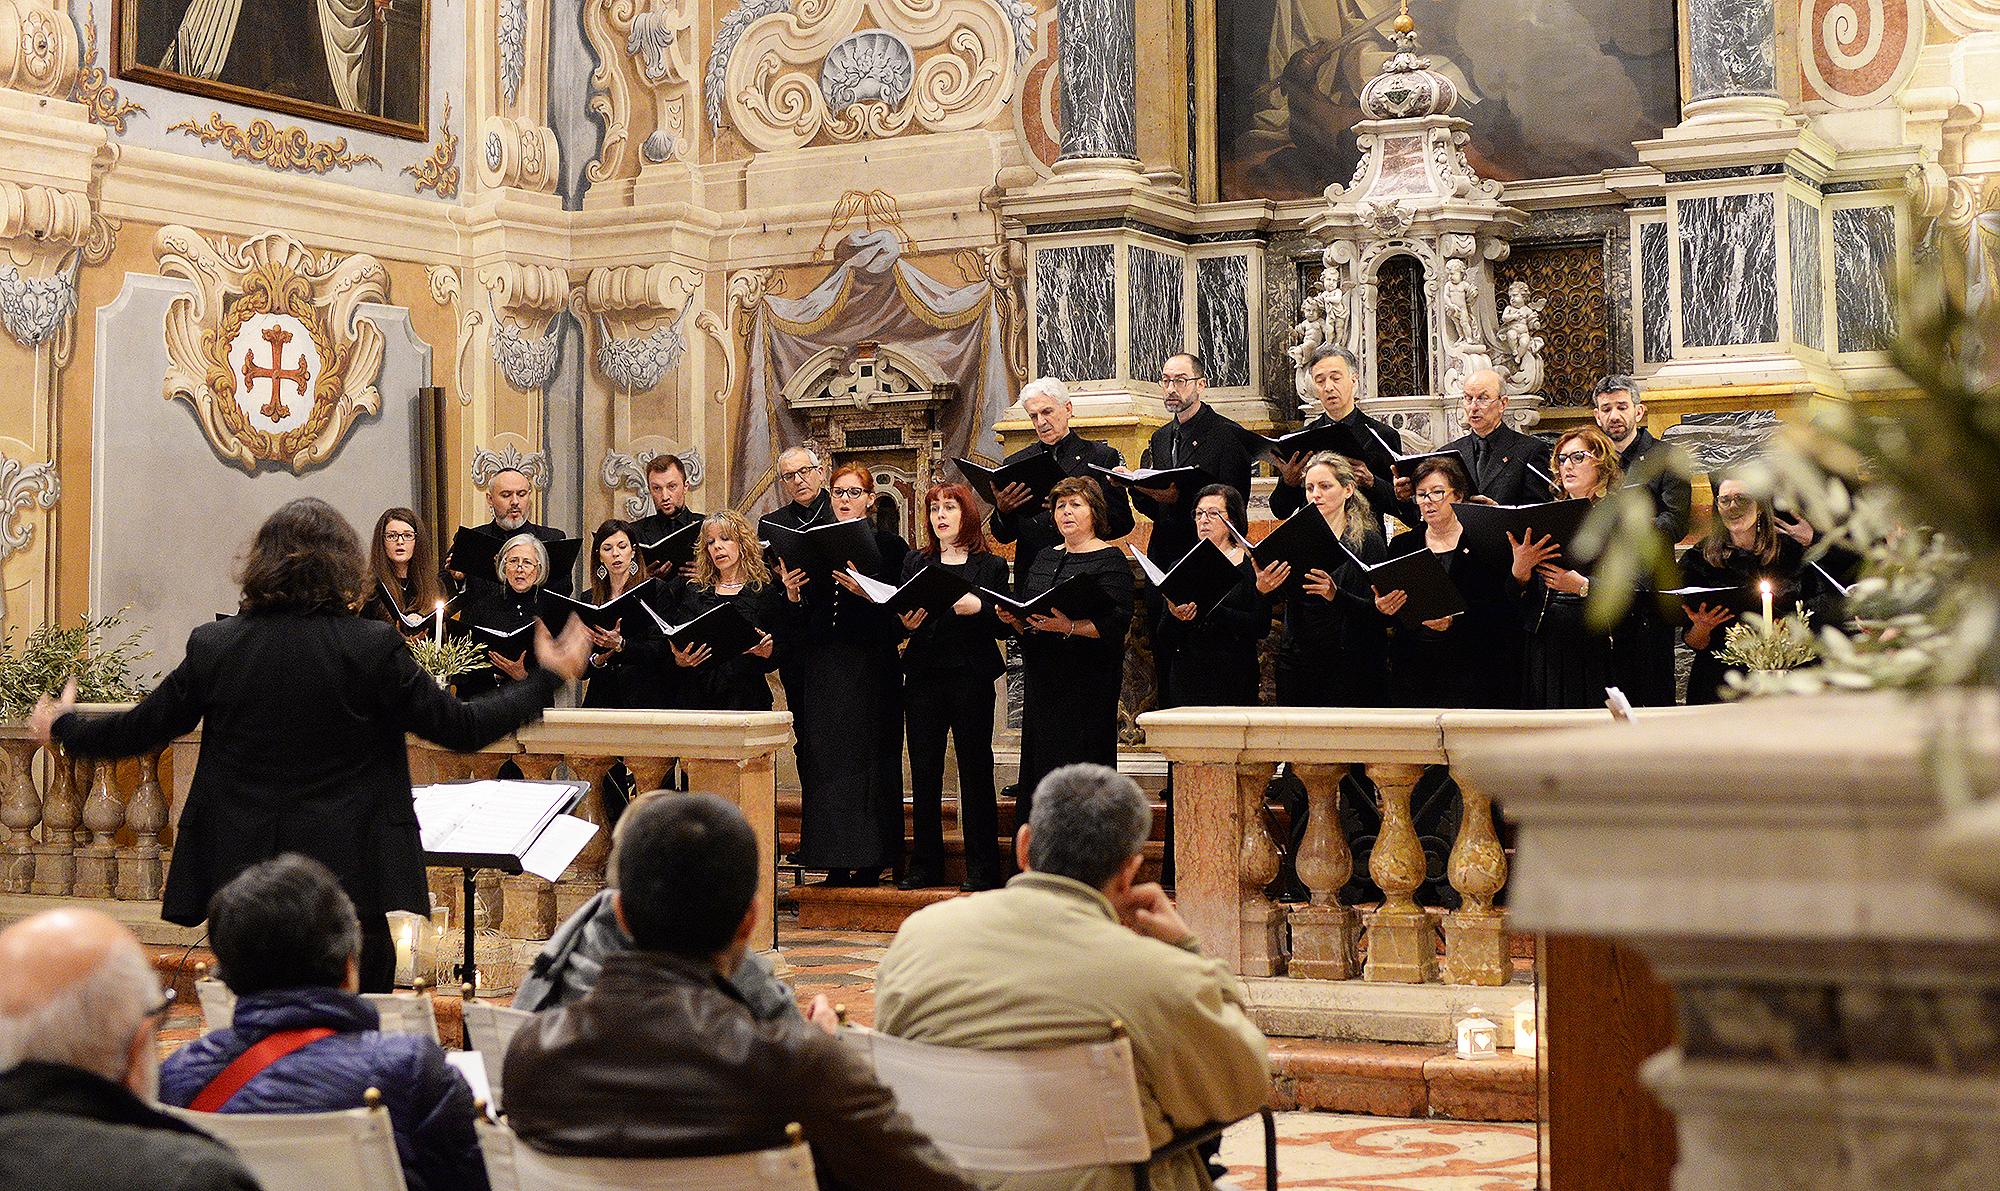 28.03.2018 - EXULTATE!, San Domenico, Verona